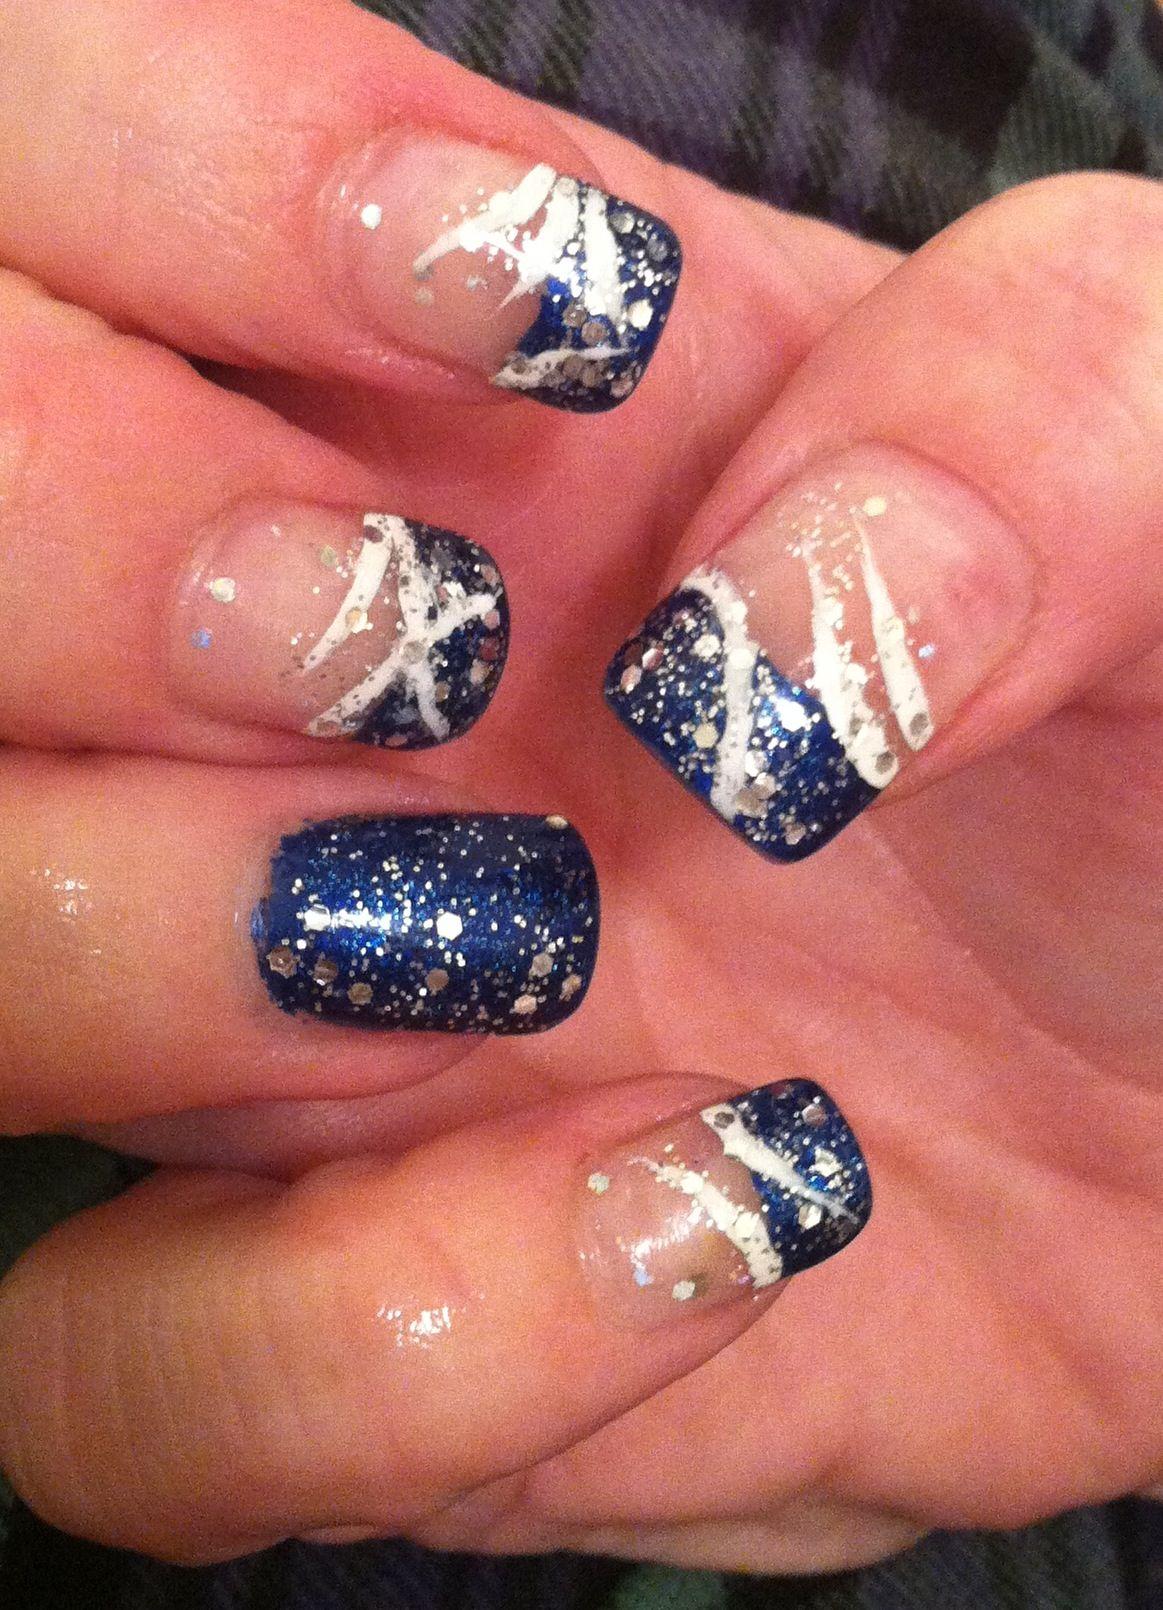 Winter nails fun for holidays | nails | Pinterest